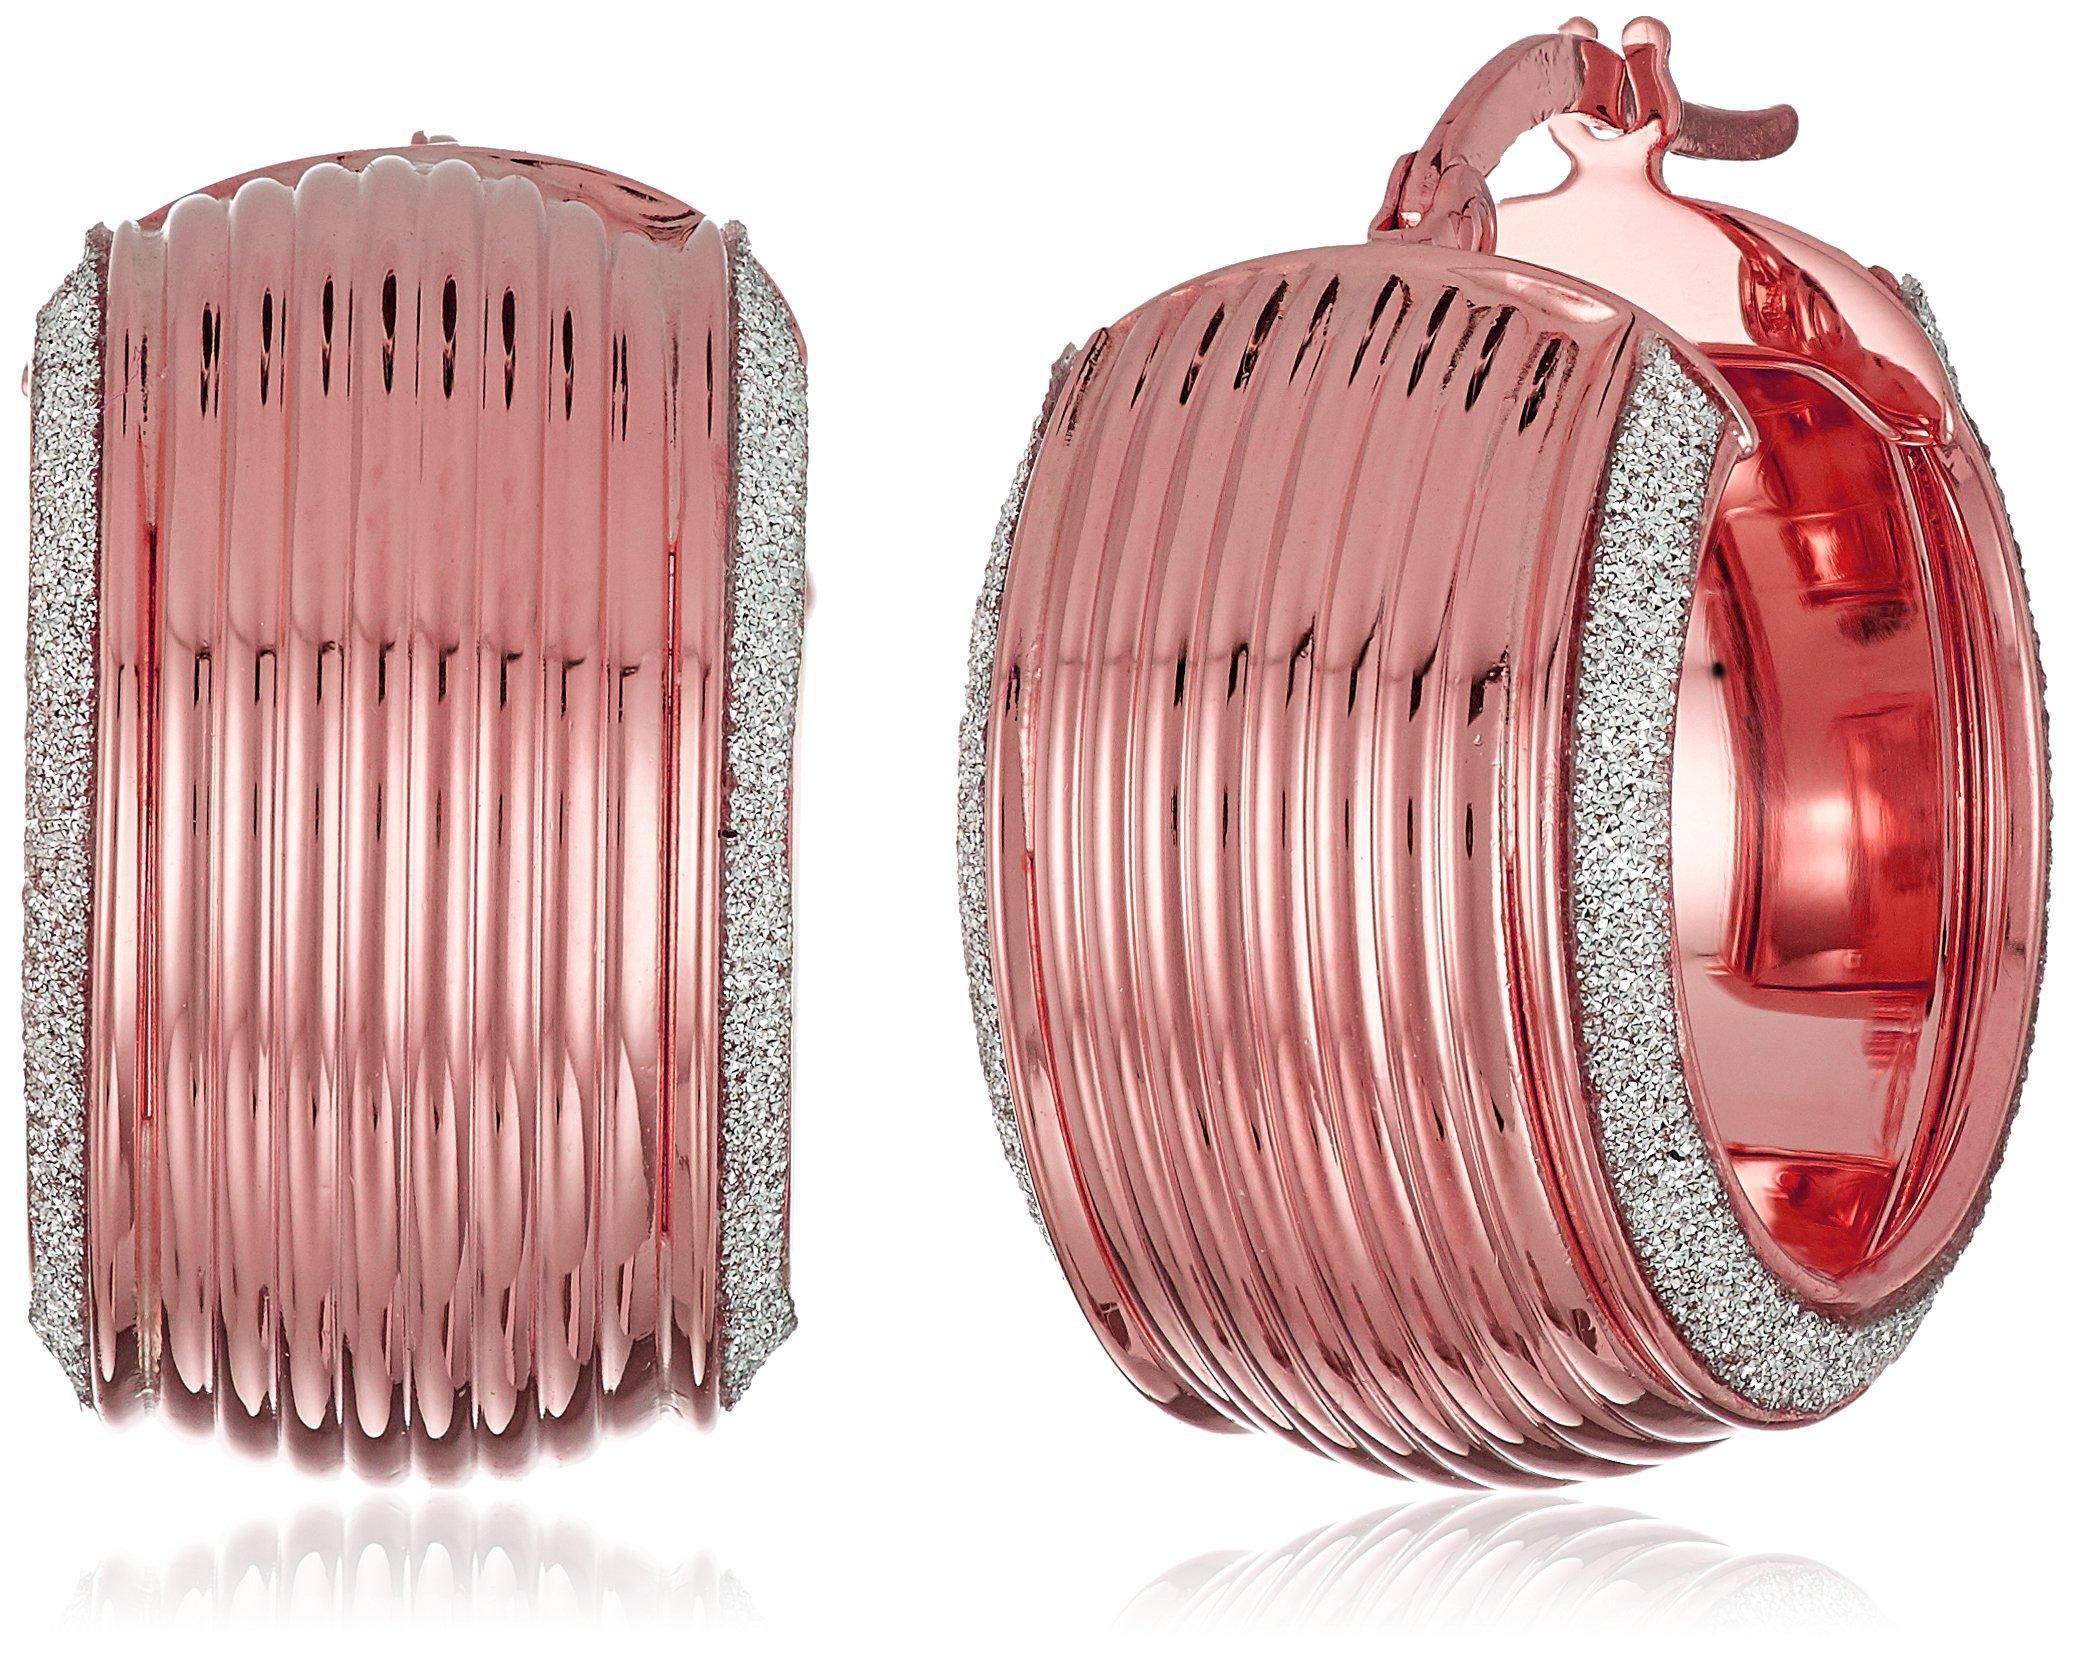 14k Rose Gold Italian Wide Hoop Earrings with Dual Pave Style Glitter Strips Hoop Earrings